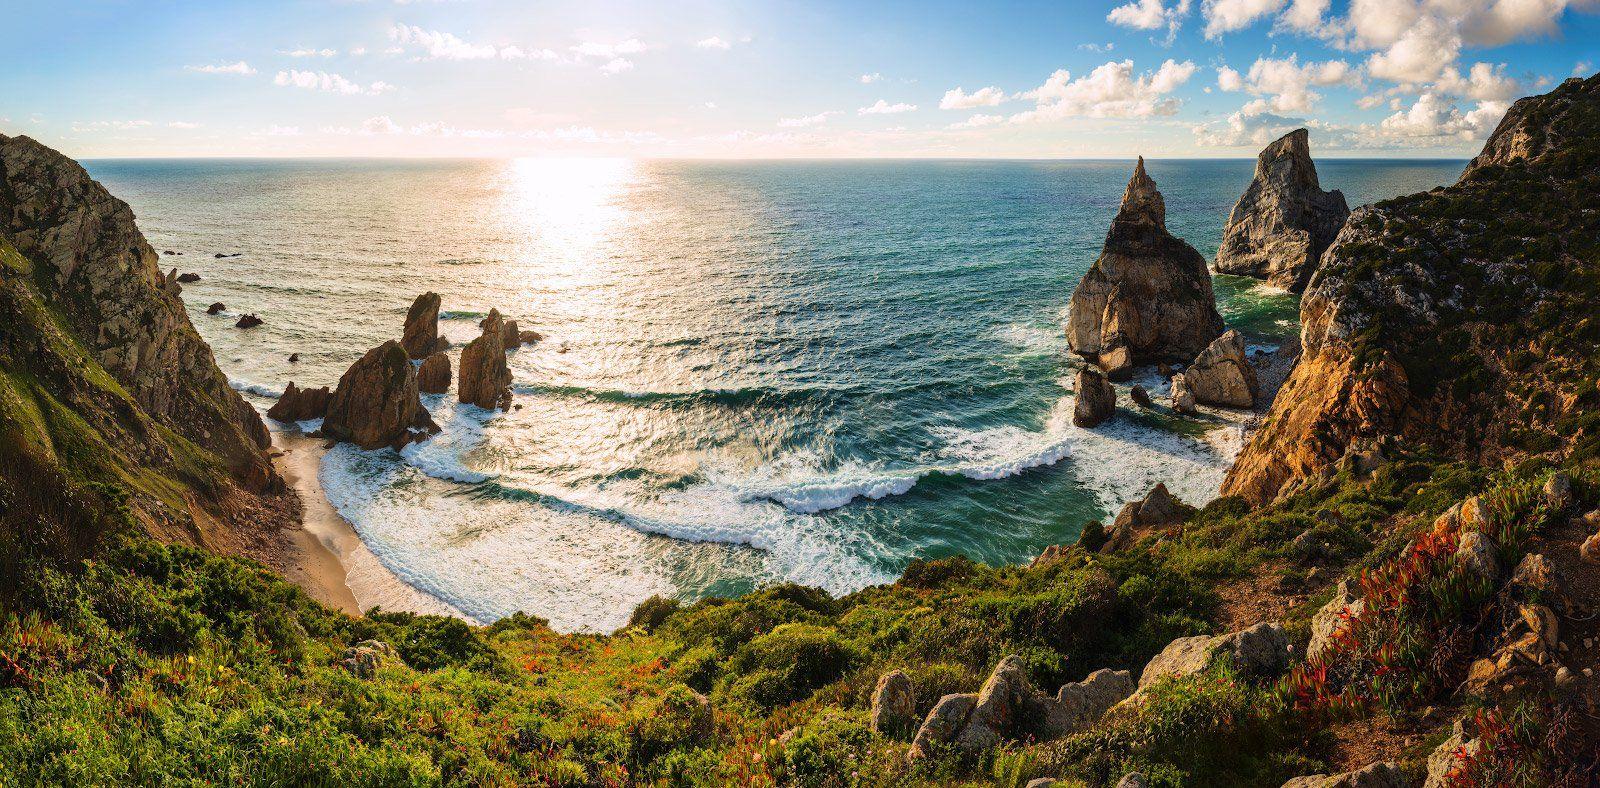 португалия, пляж, урса, Александр Константинов